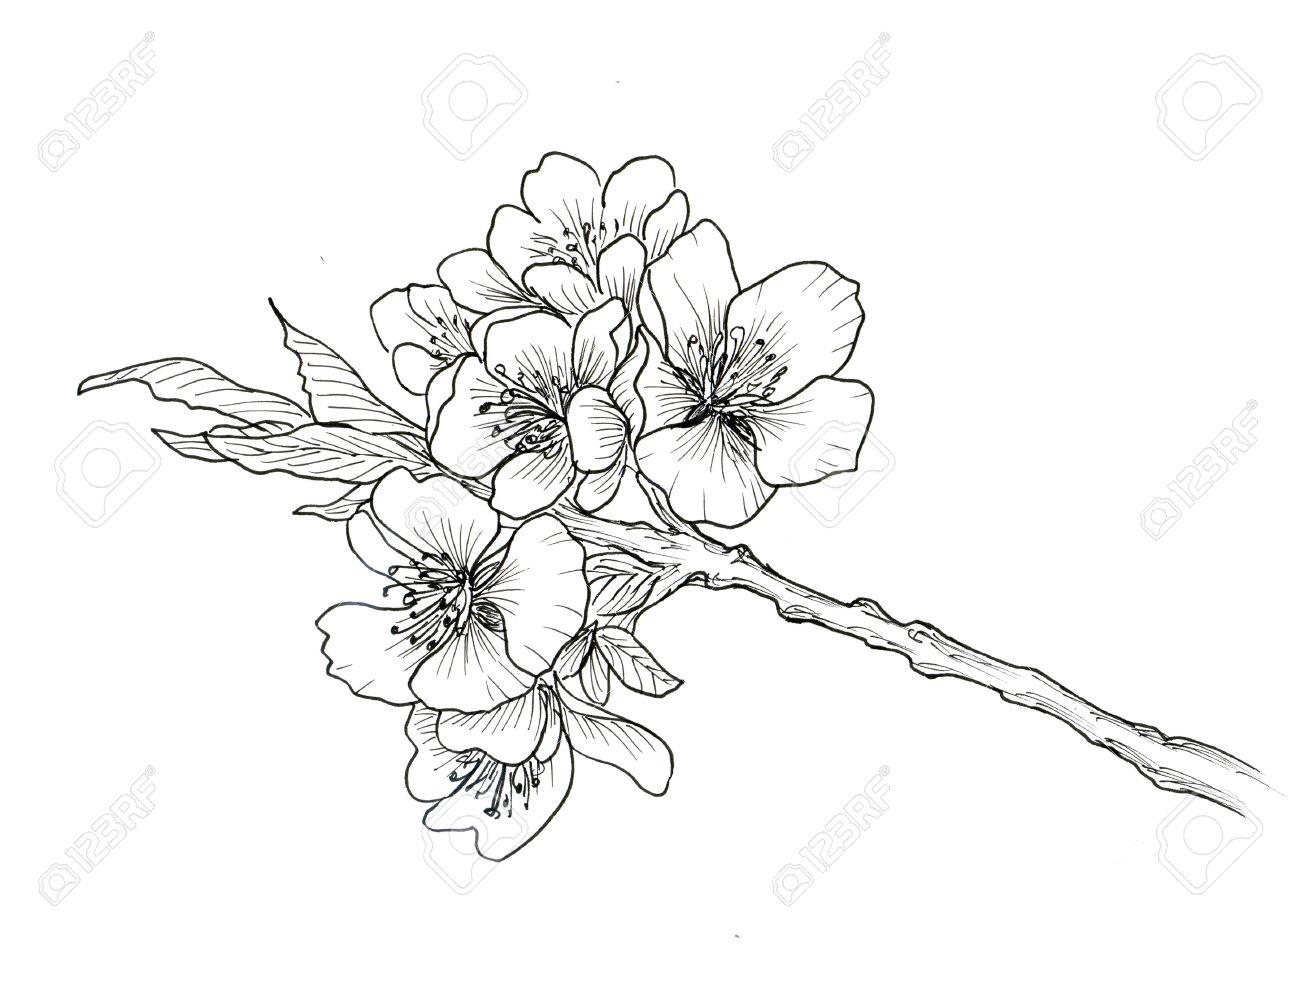 Tatouage Fleur De Cerisier Noir Et Blanc Awesome Blossom Tattoos